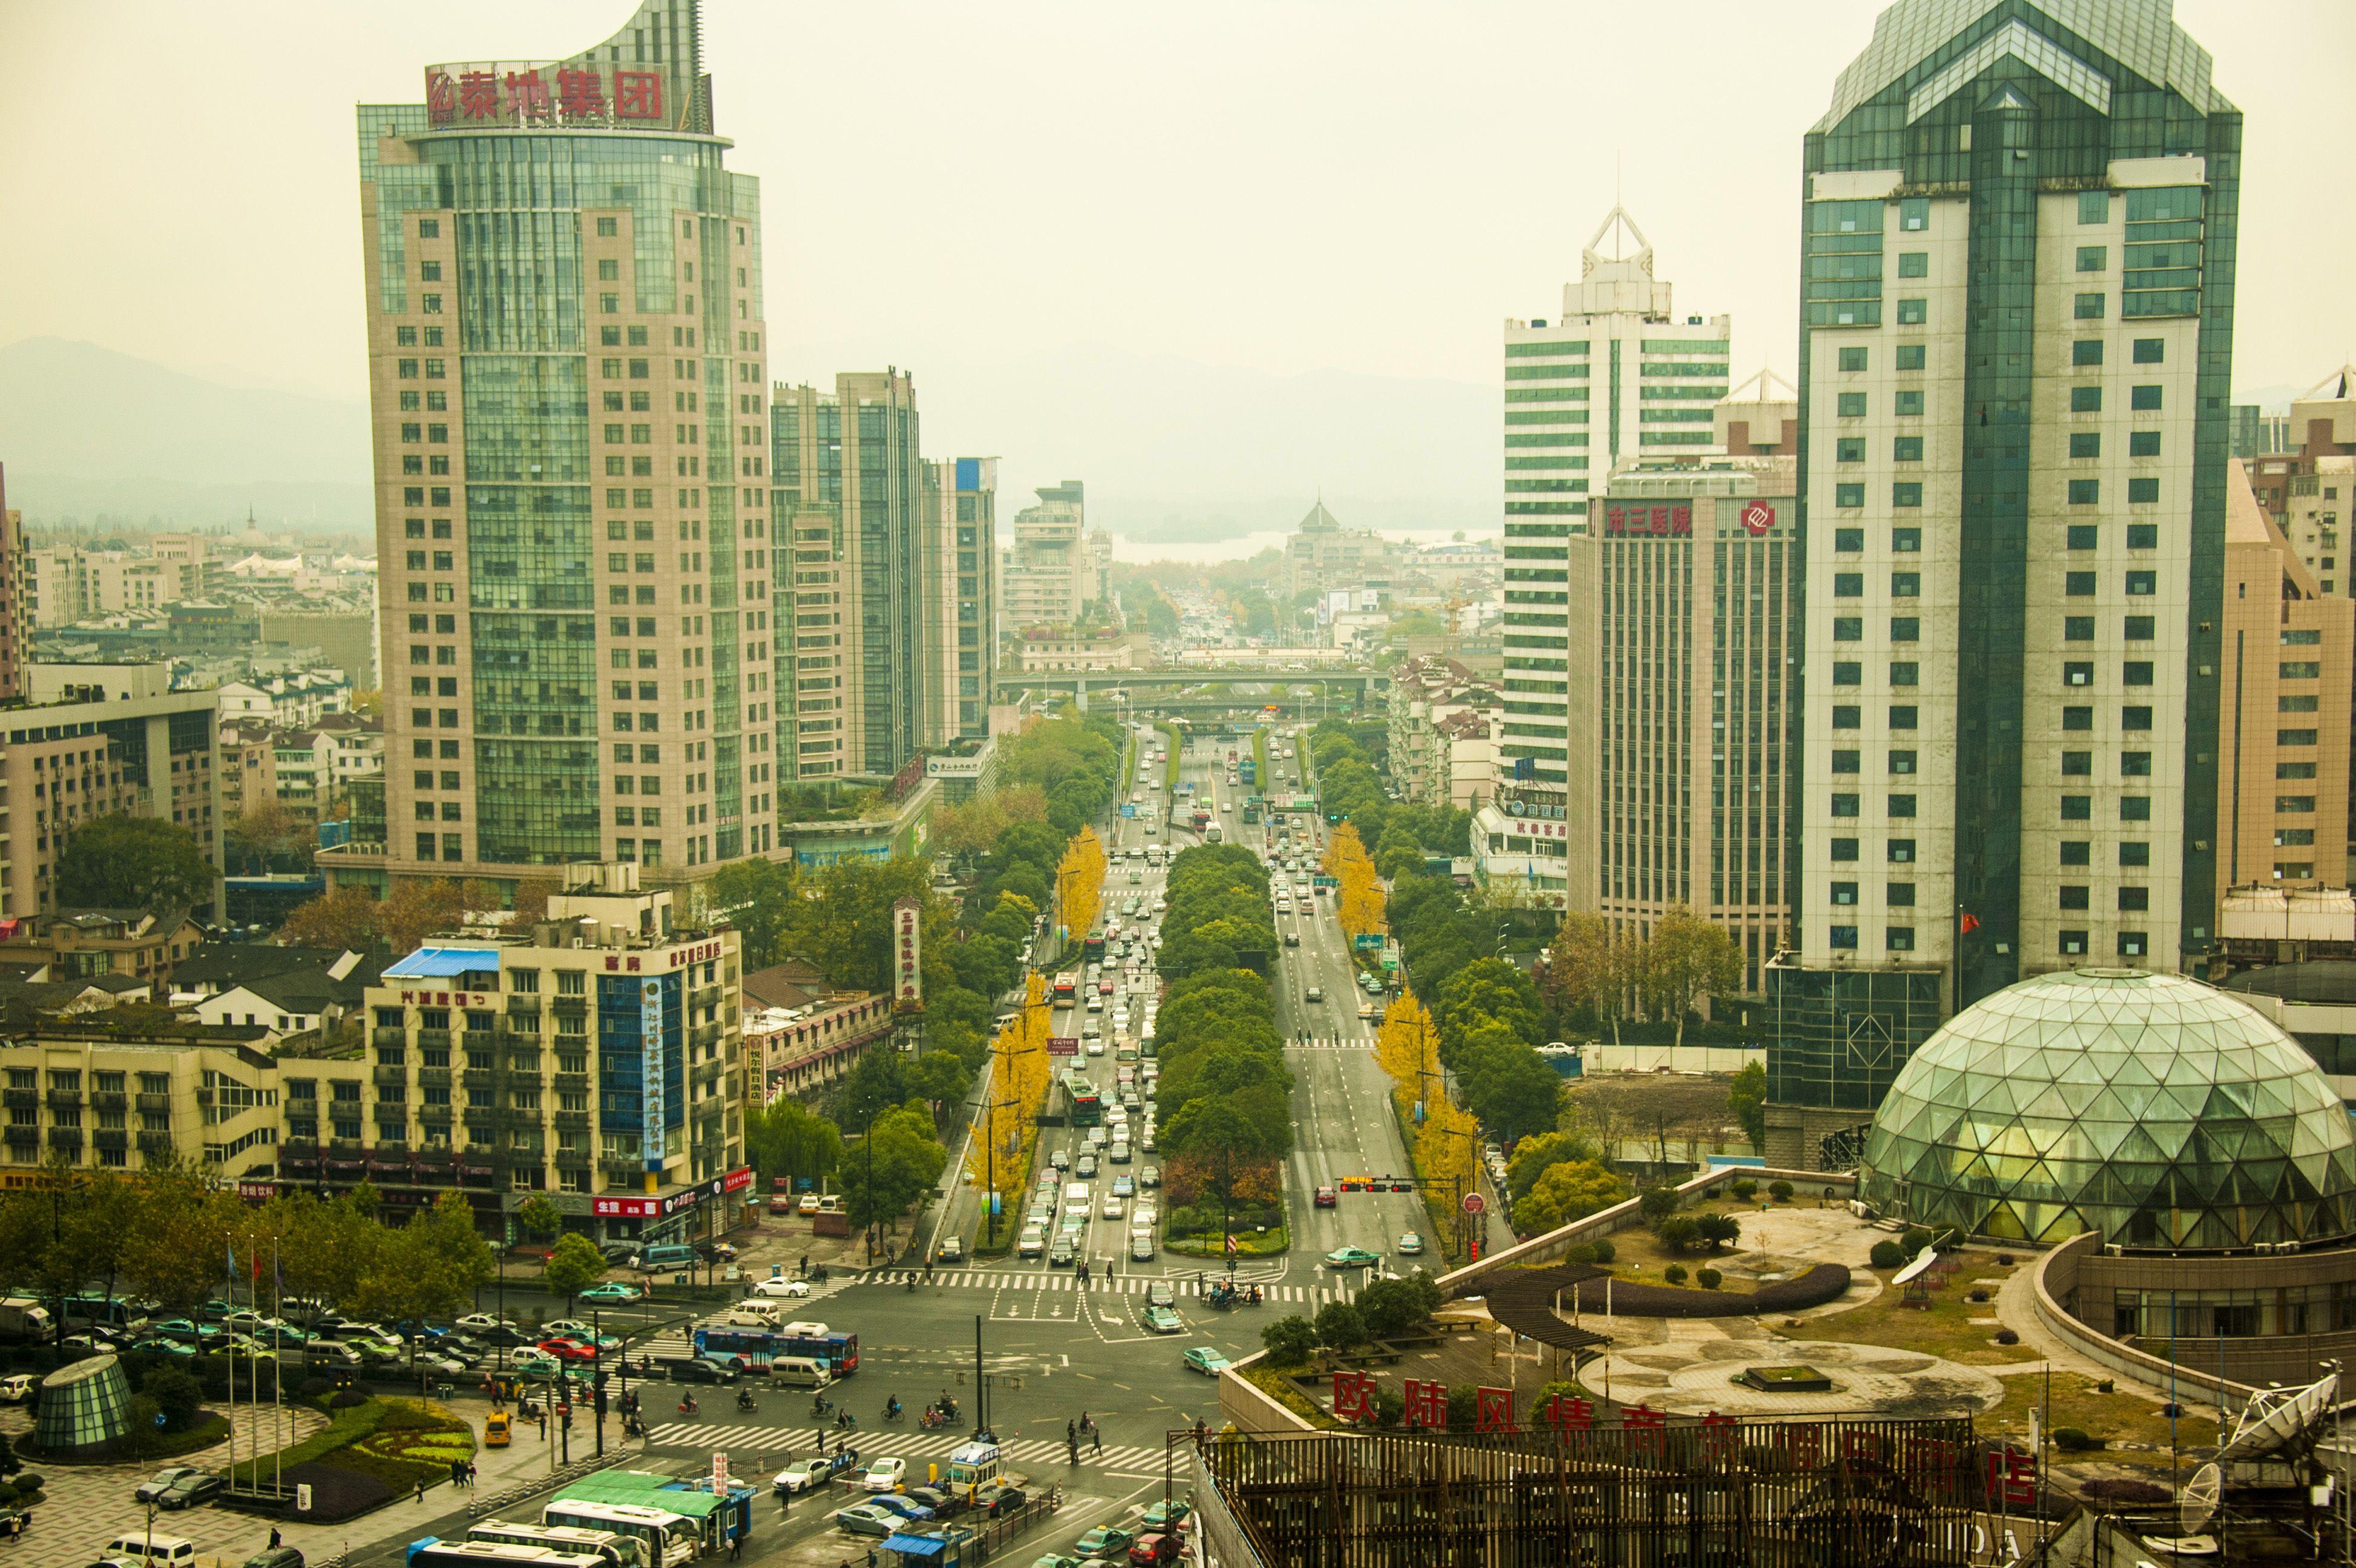 Central Hangzhou looking toward West Lake. Taken Dec 2012.